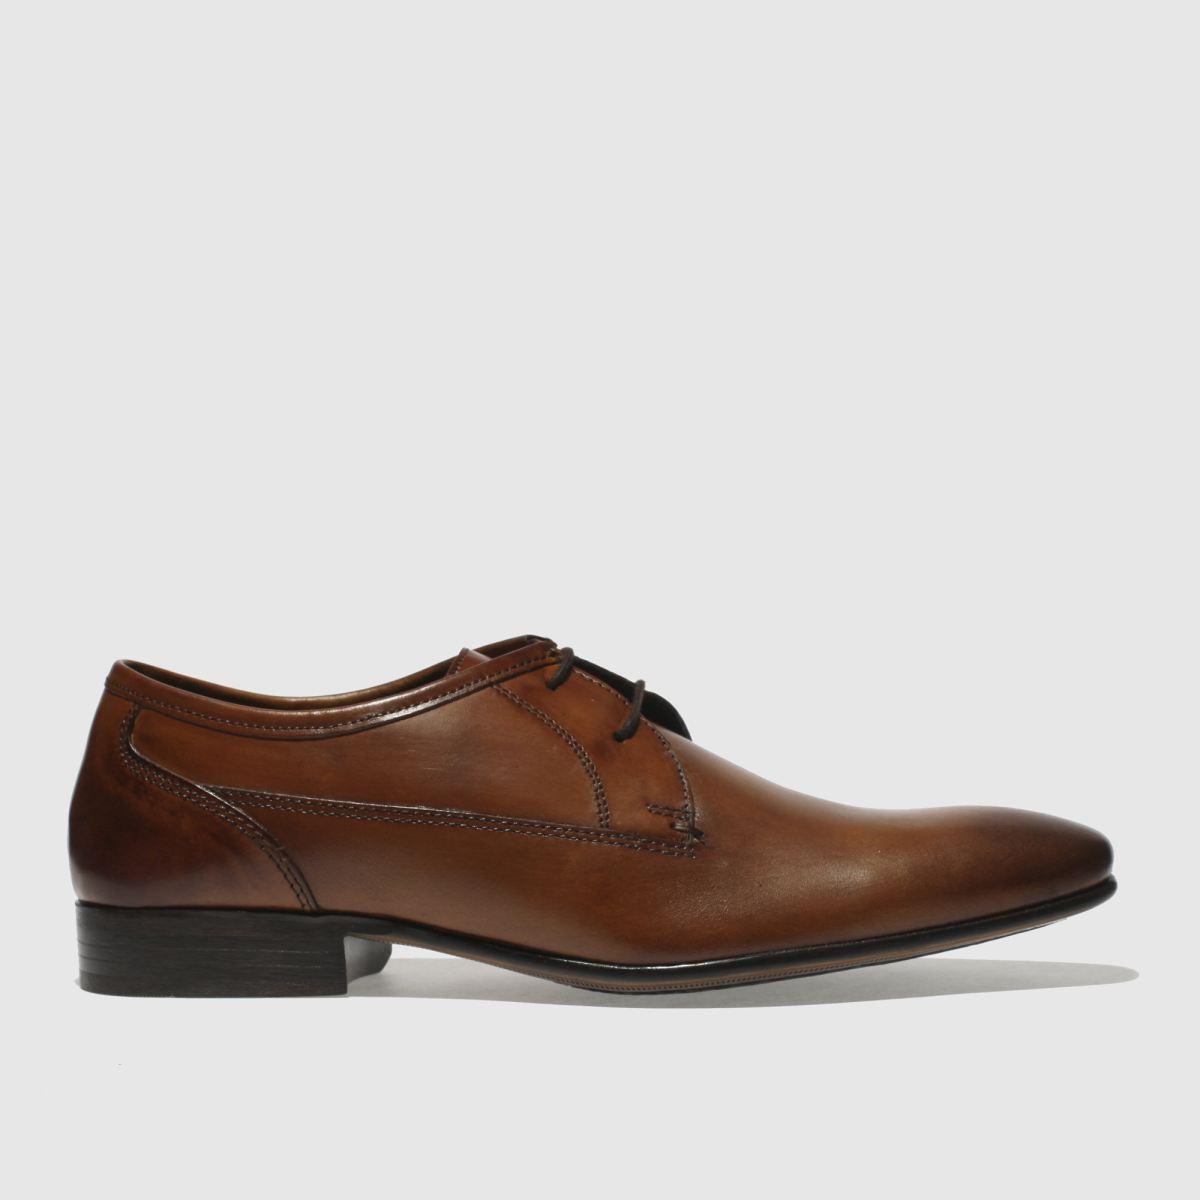 Ikon Ikon Tan Bowles Gibson Shoes